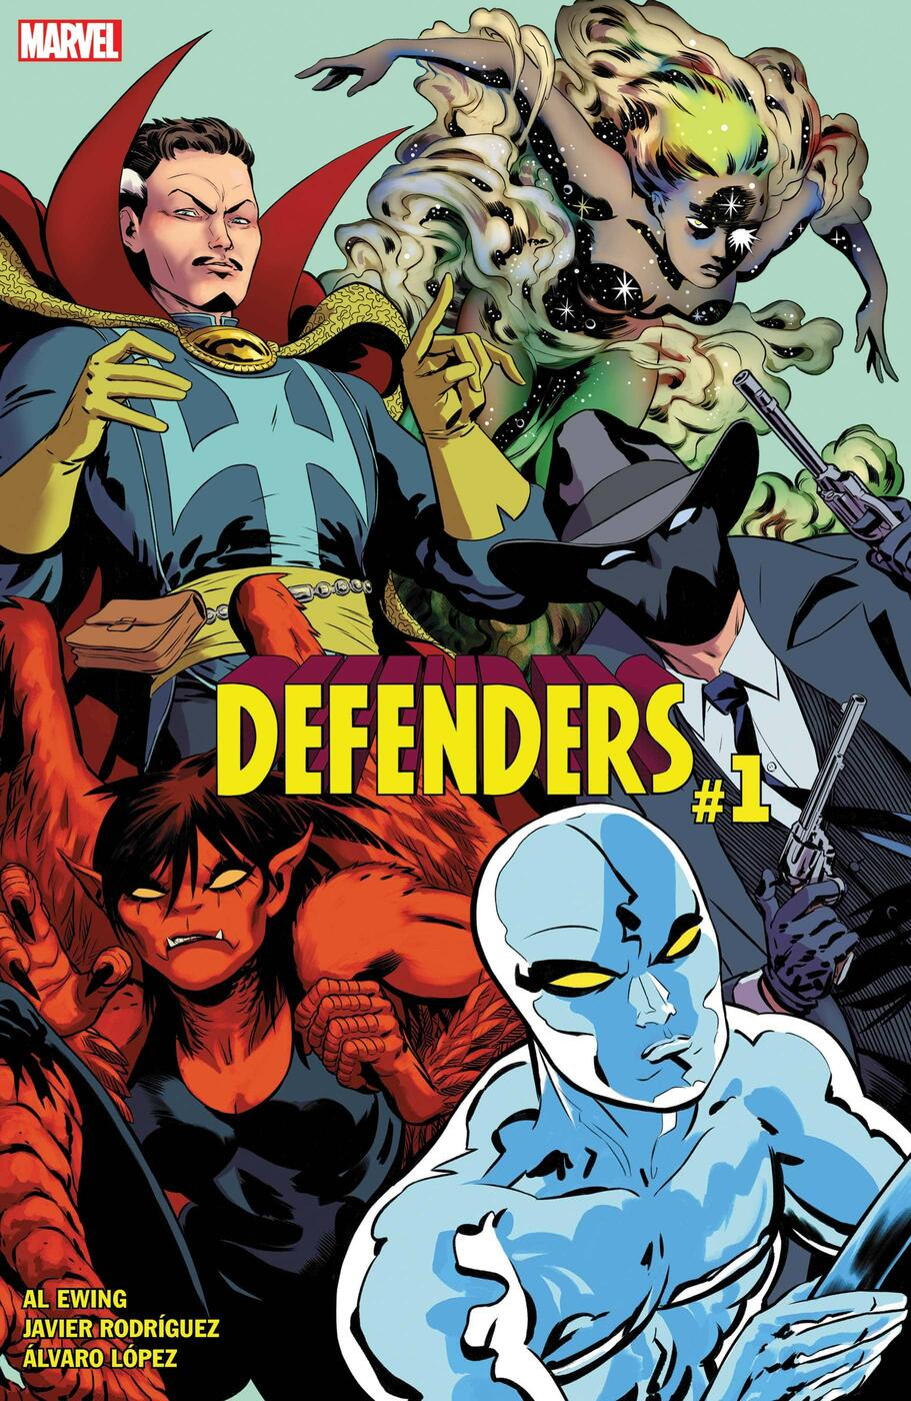 DEFENDERS #1 cover by Javier Rodriguez